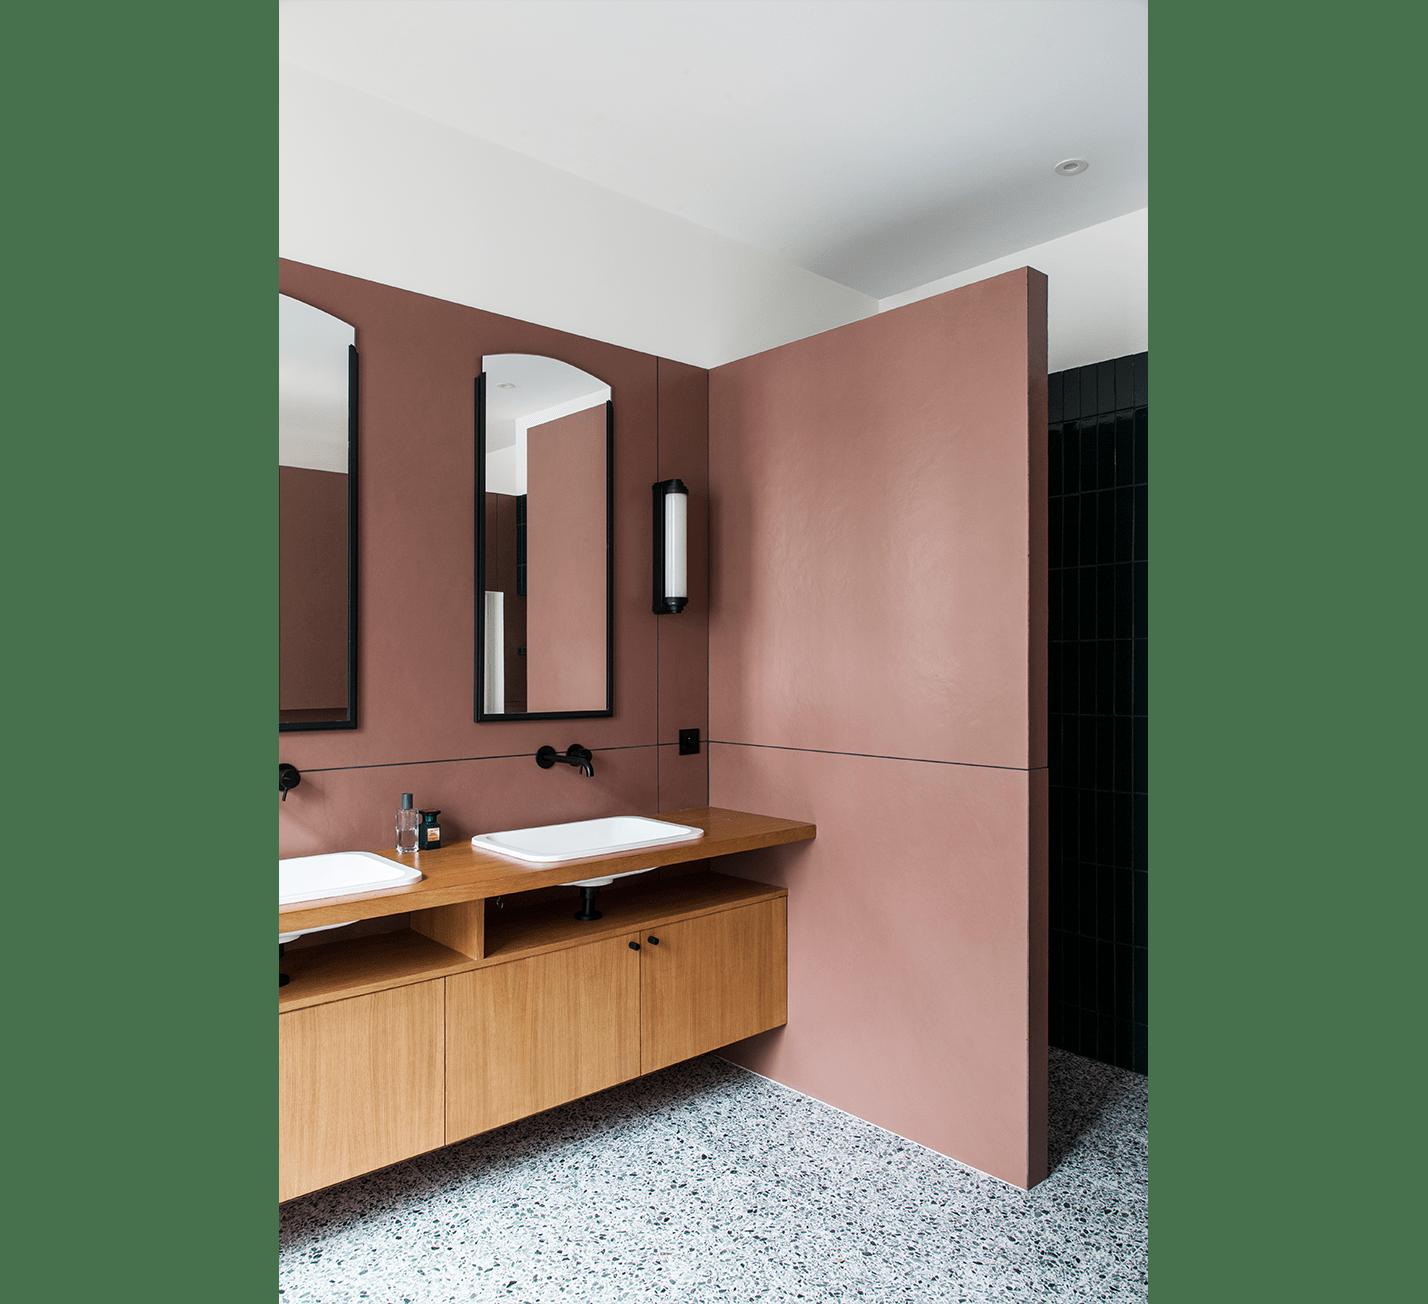 Projet-Arlequin-Atelier-Steve-Pauline-Borgia-Architecture-interieur-04-min